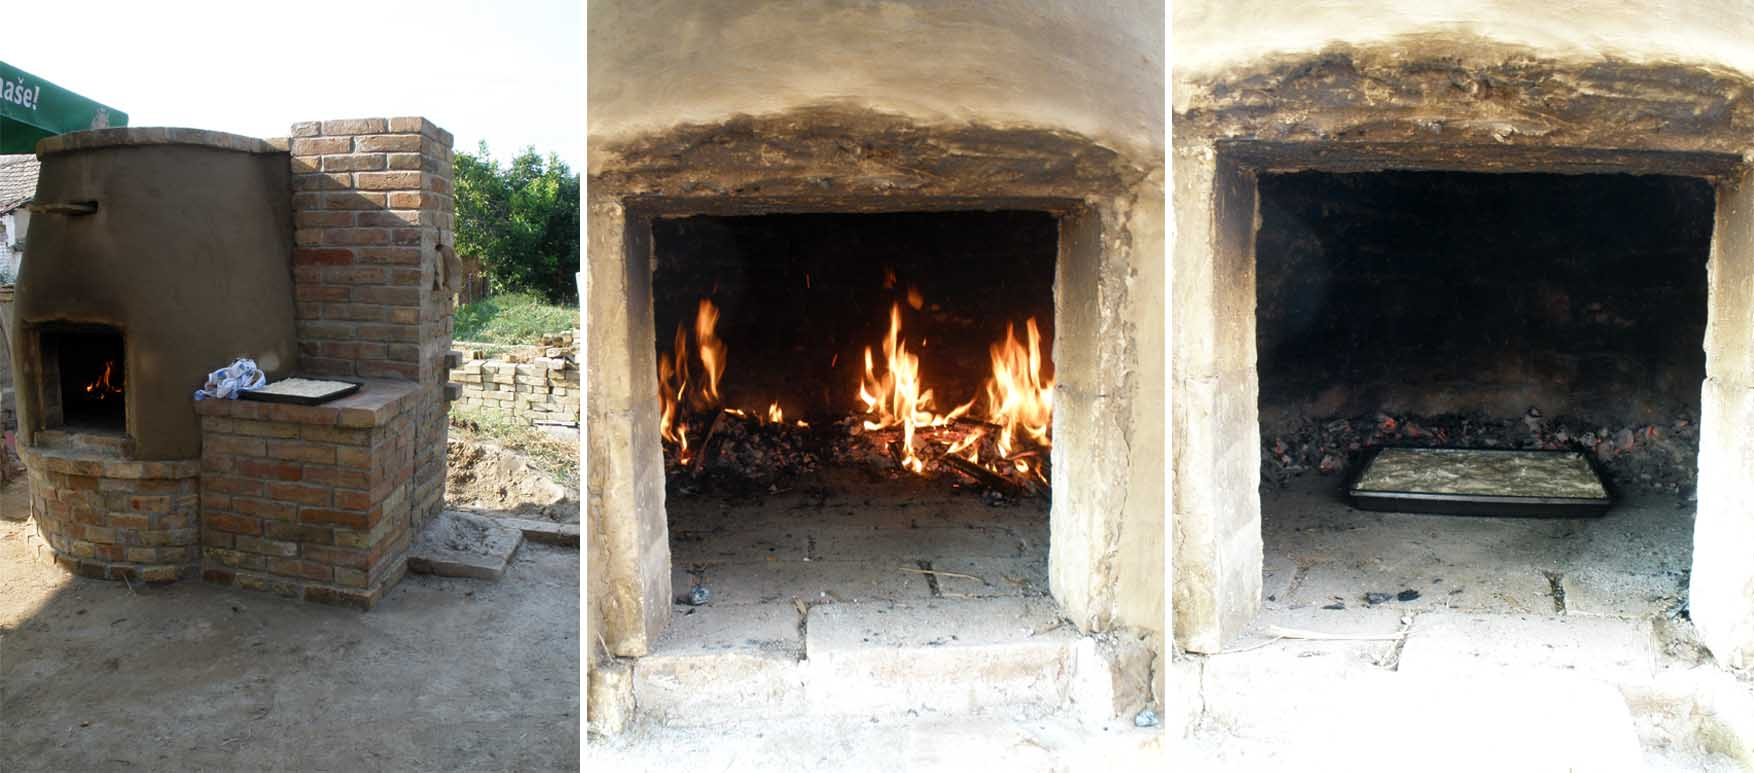 54 pećke Vass Zoltan žemska pećka radionica peti dan prva vatra